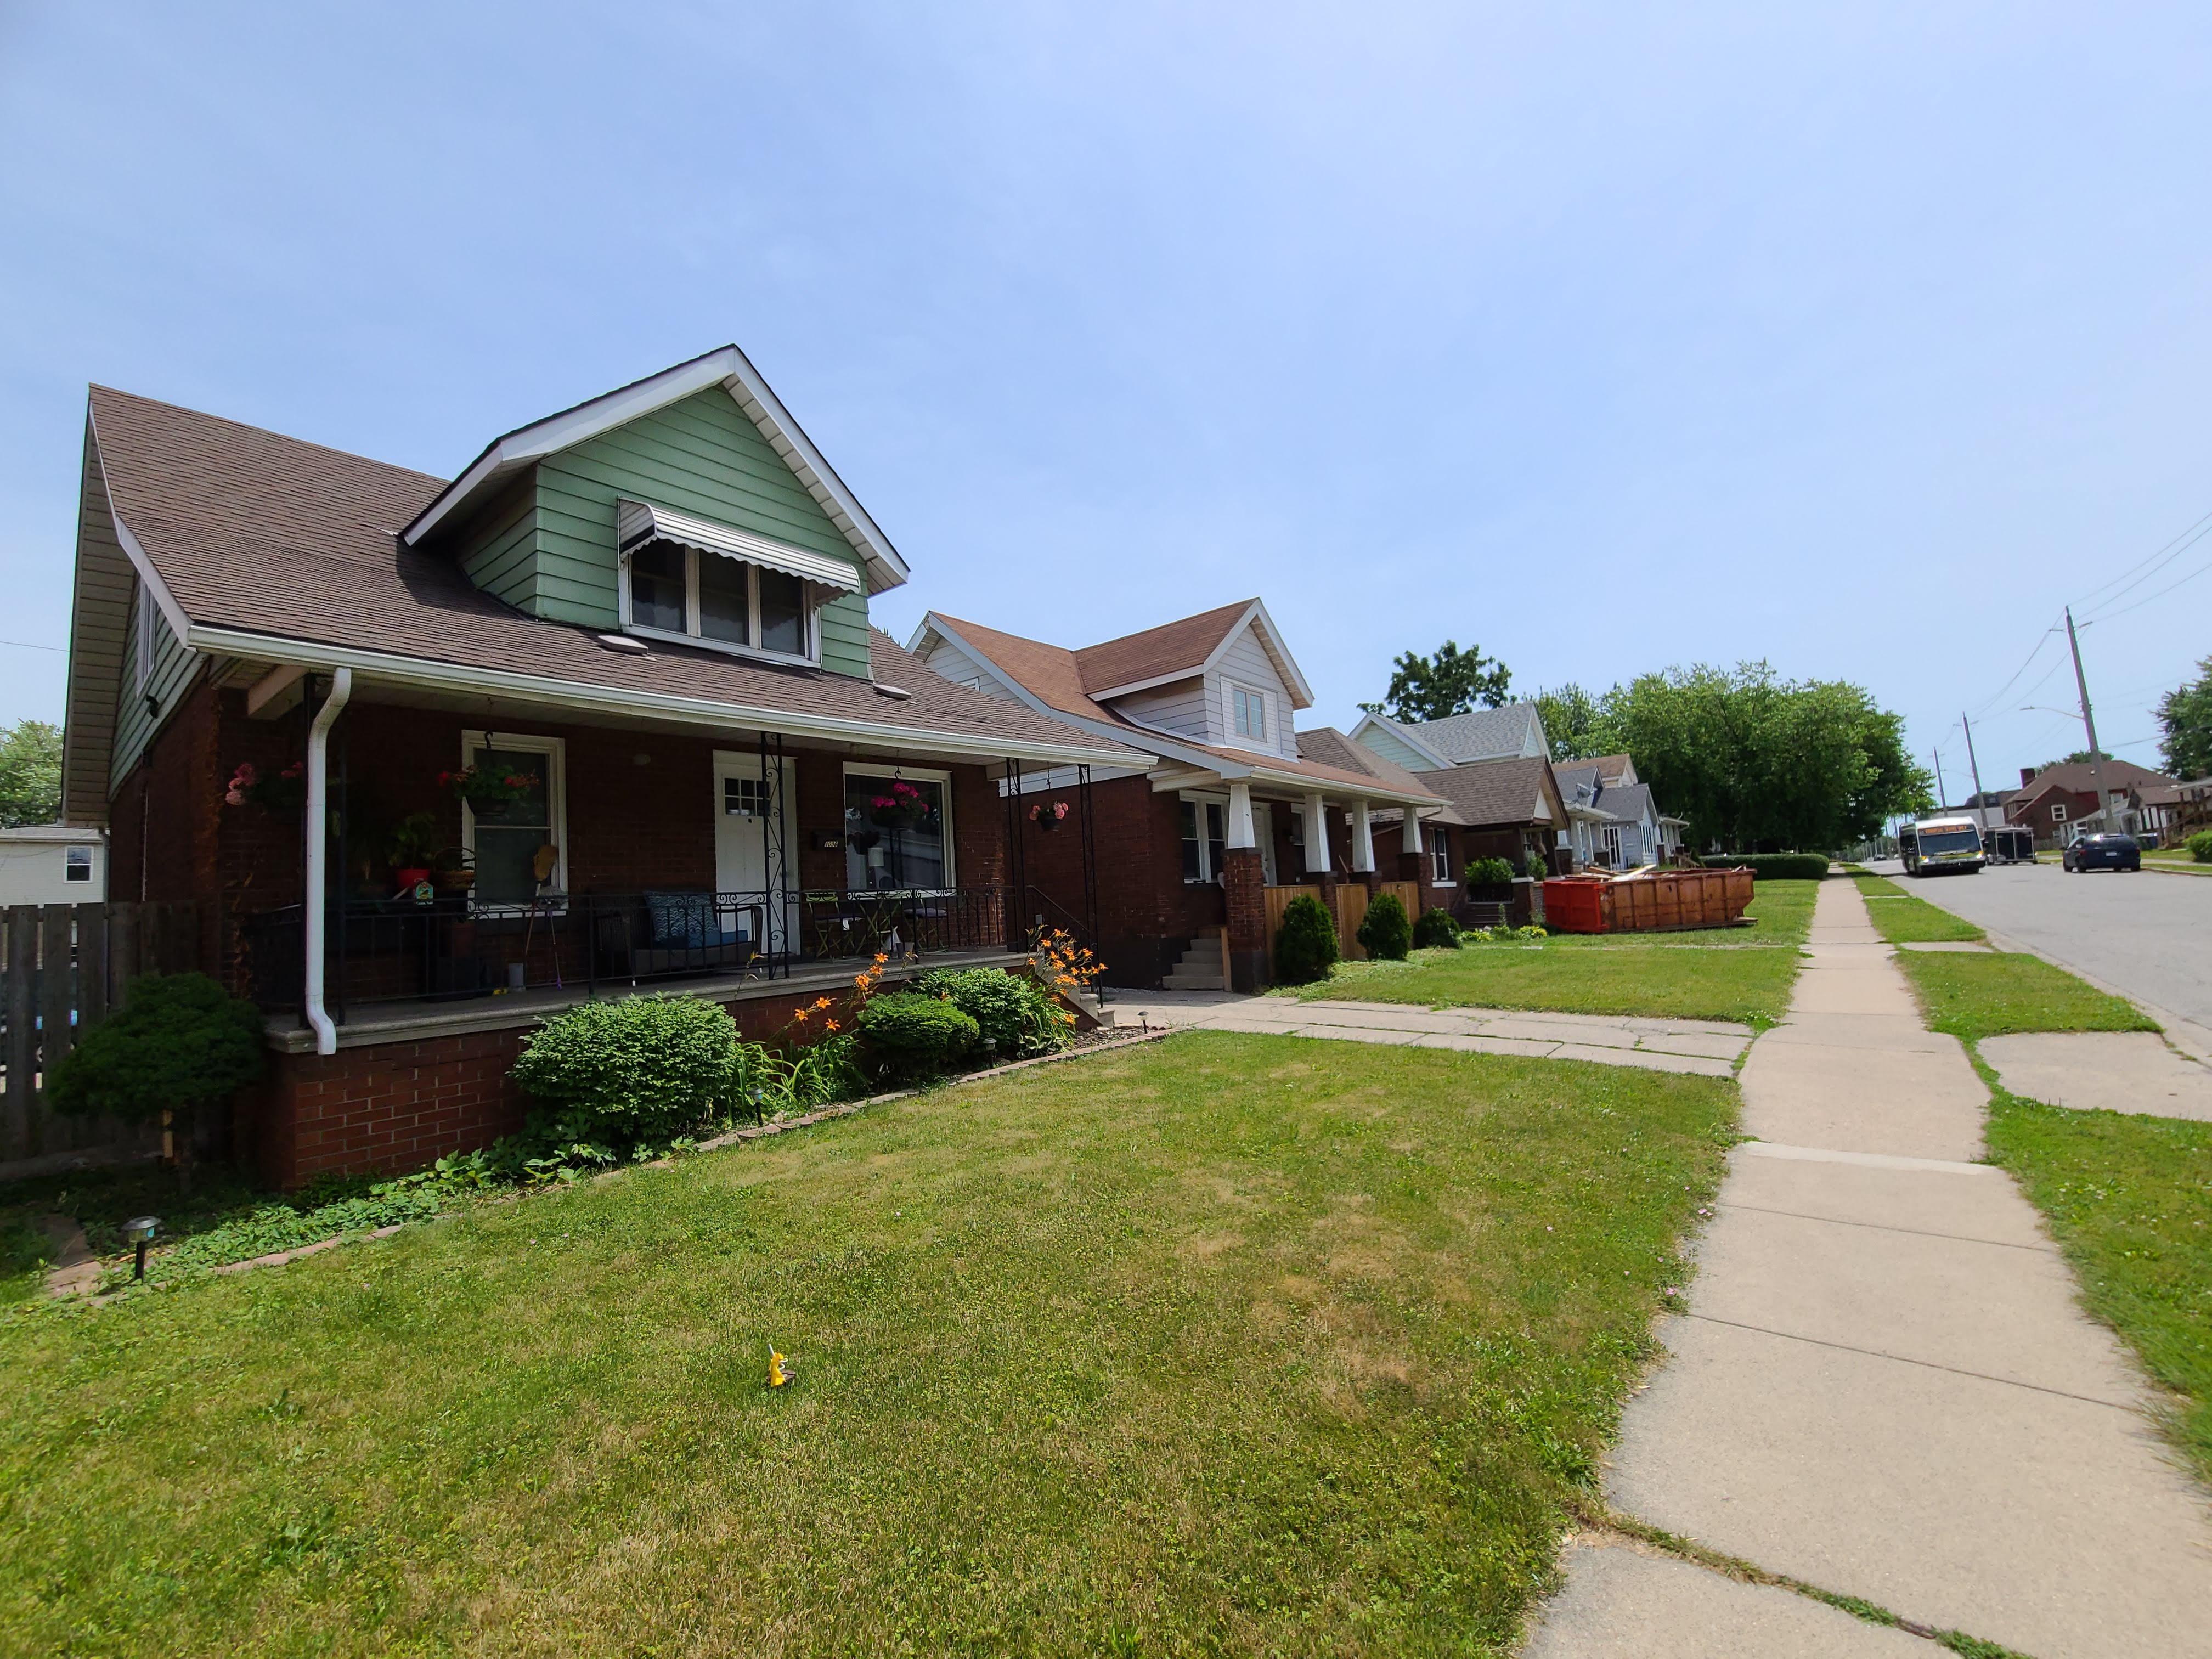 1006 Felix Ave, Windsor, Ontario  N9C 3L5 - Photo 4 - RP5413743784